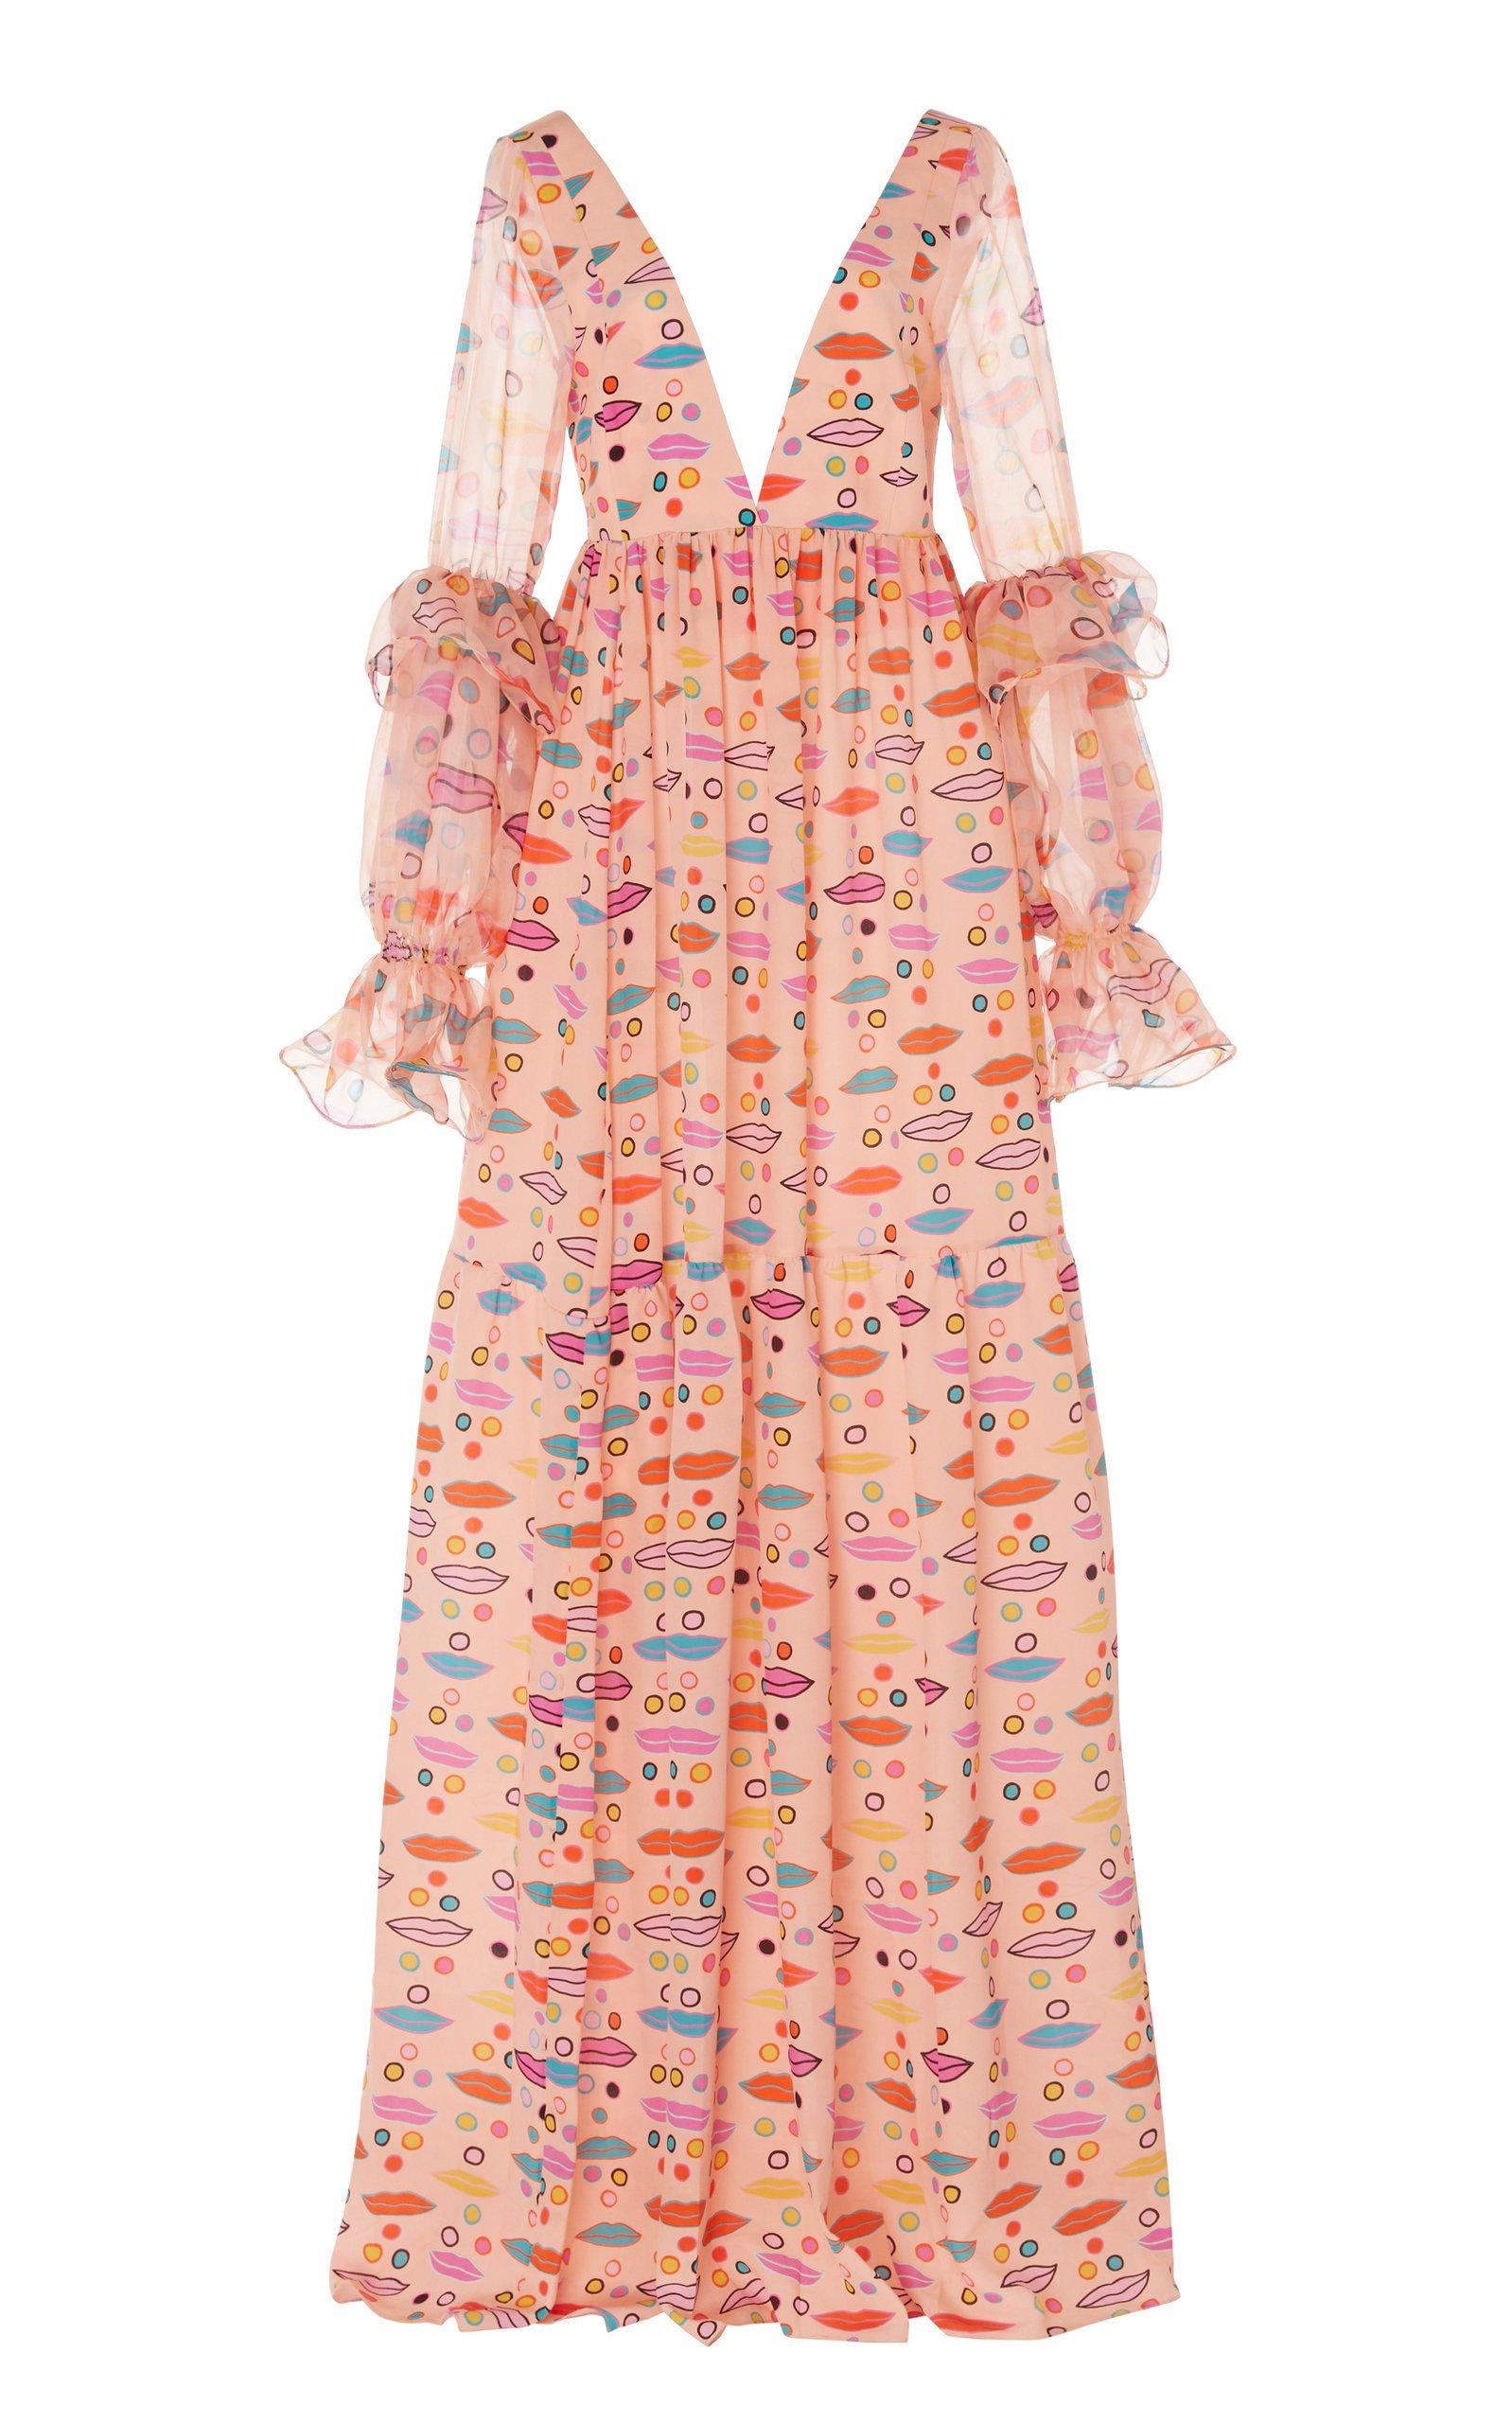 Leal Daccarett Lipari Crepe De Chine Dress Size: 4